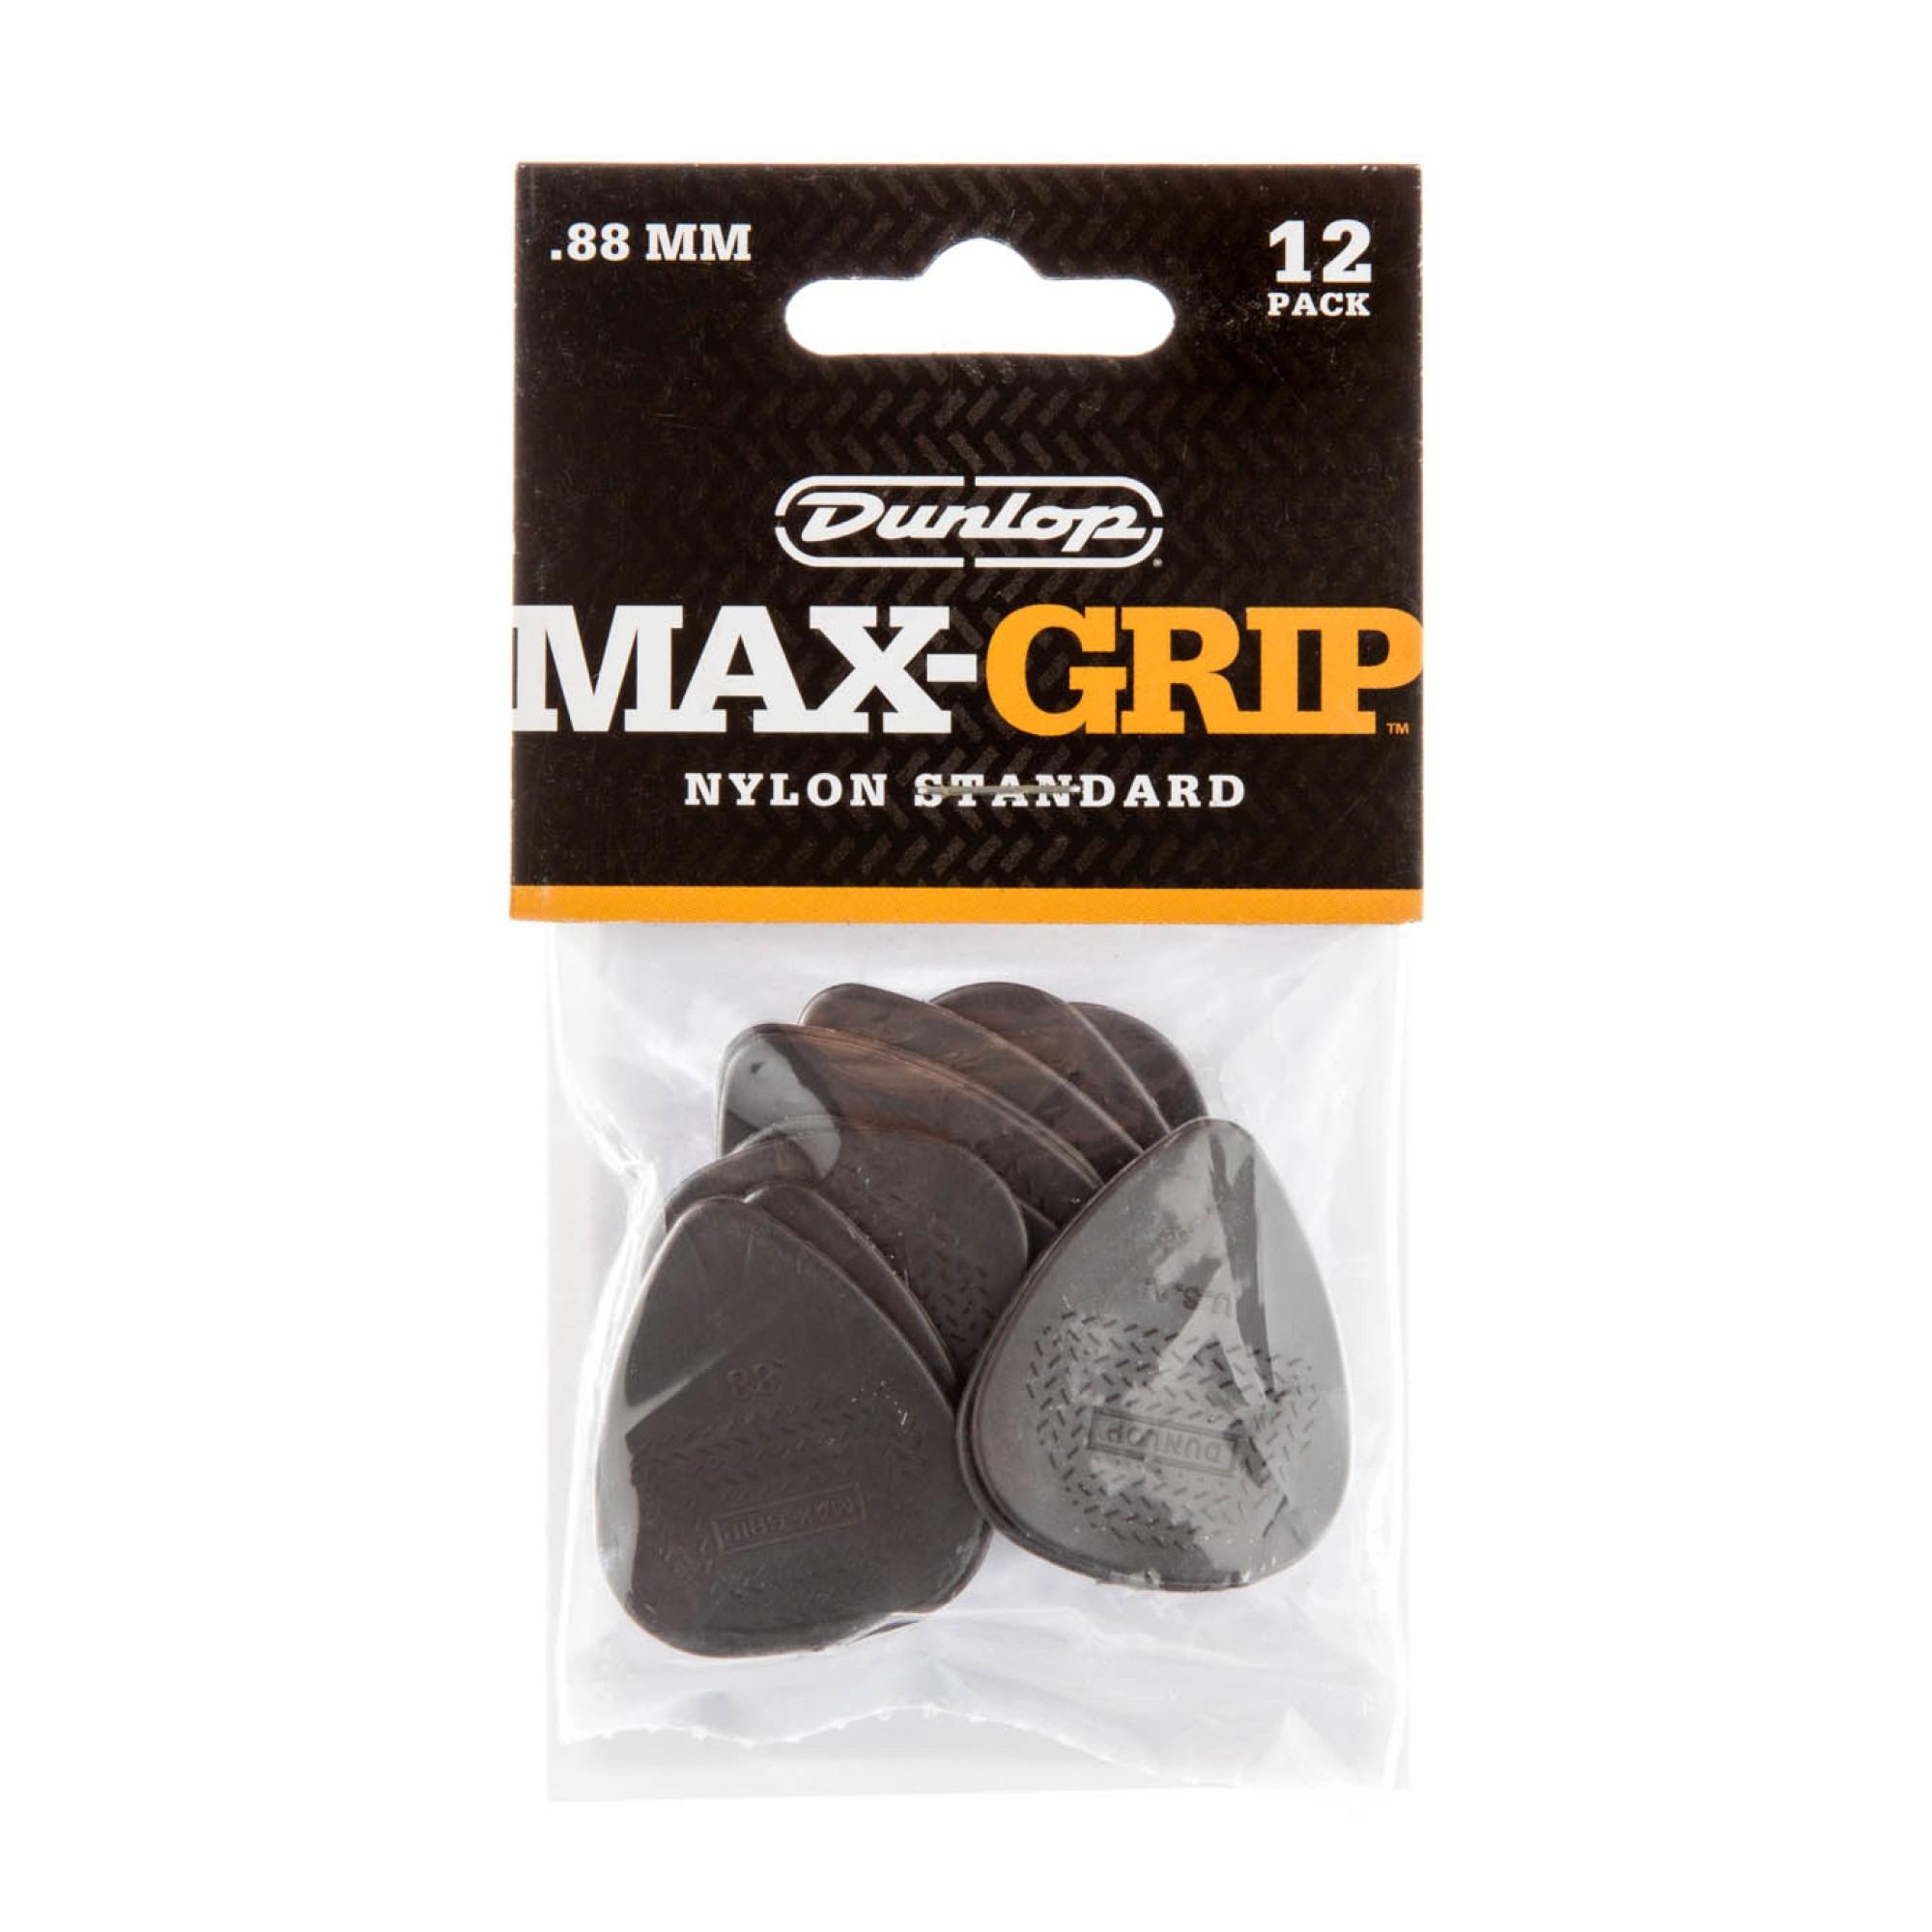 Dunlop Plectrum Nylon Max Grip 0,88mm 12 Stk